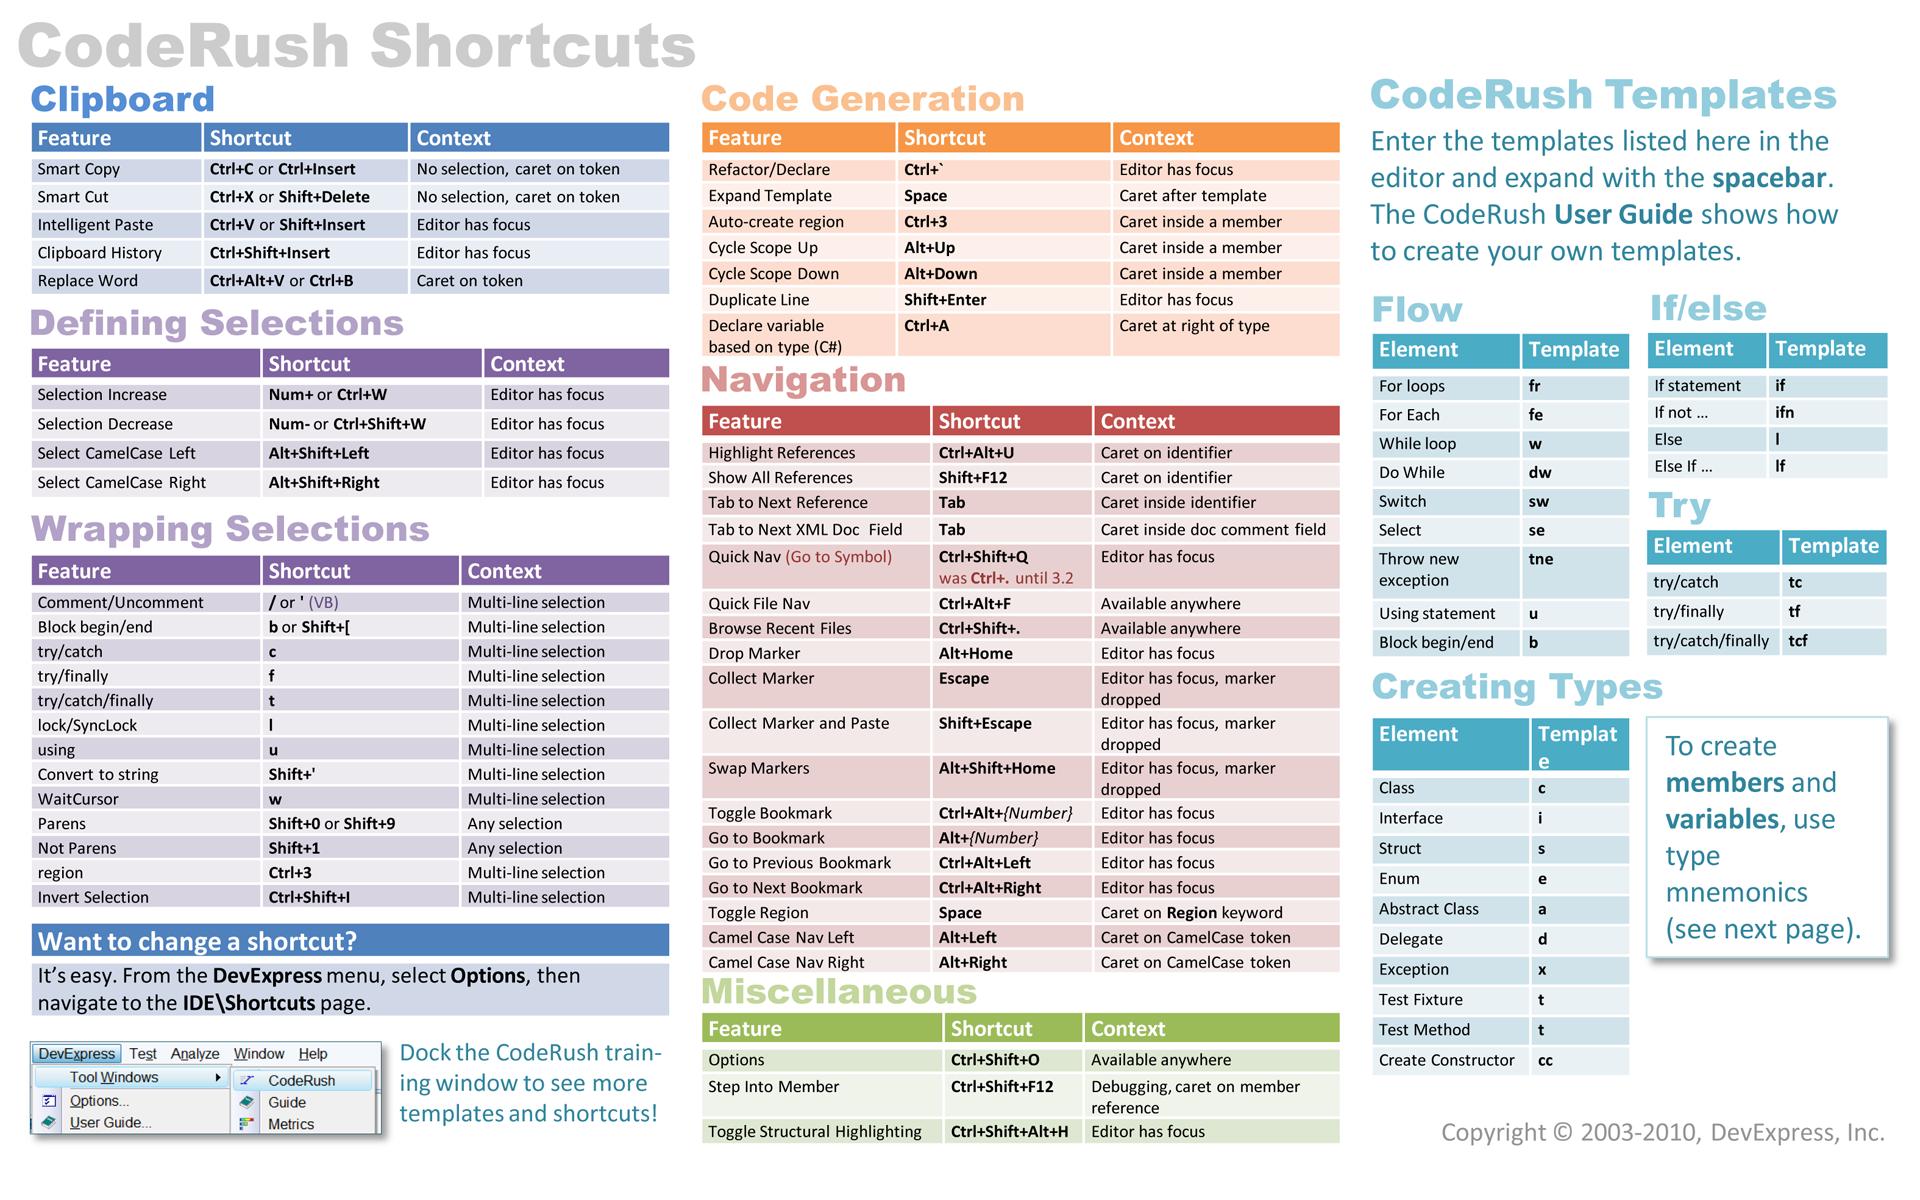 CodeRush shortcuts and templates cheat sheet   DevExpress